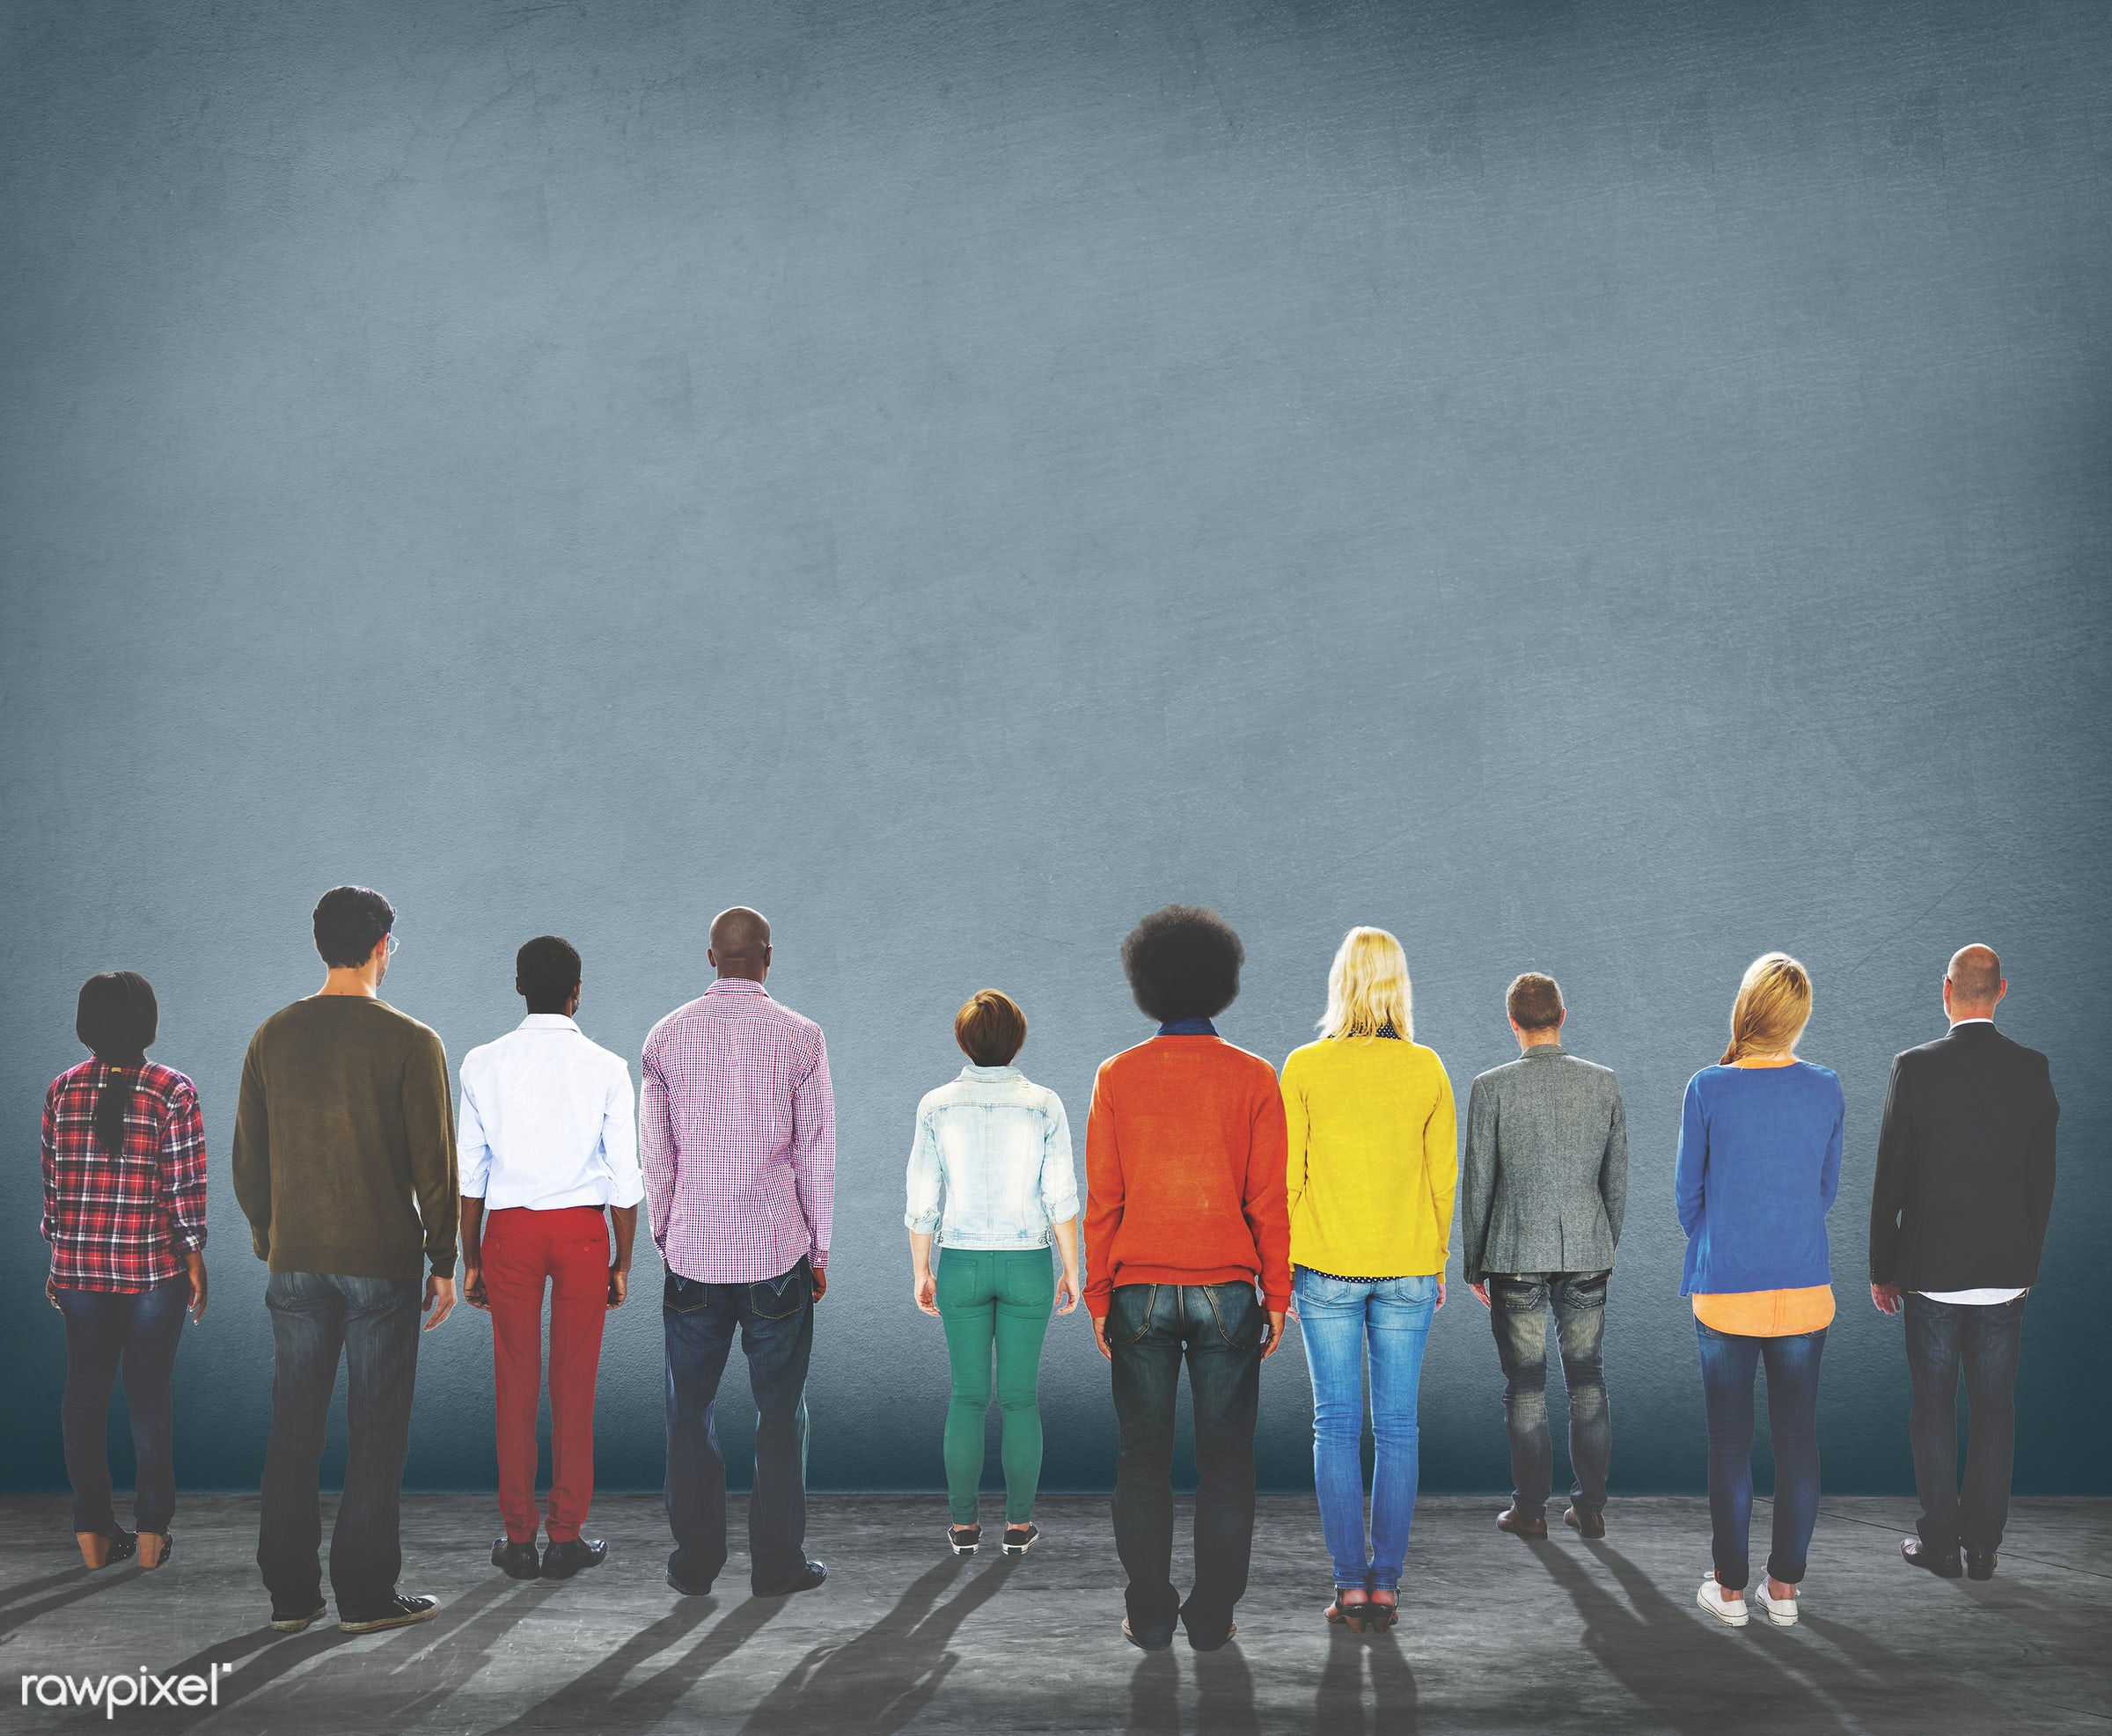 african descent, aspiration, backgrounds, backside, casual, cement, colorful, copy space, diverse, diversity, ethnicity,...